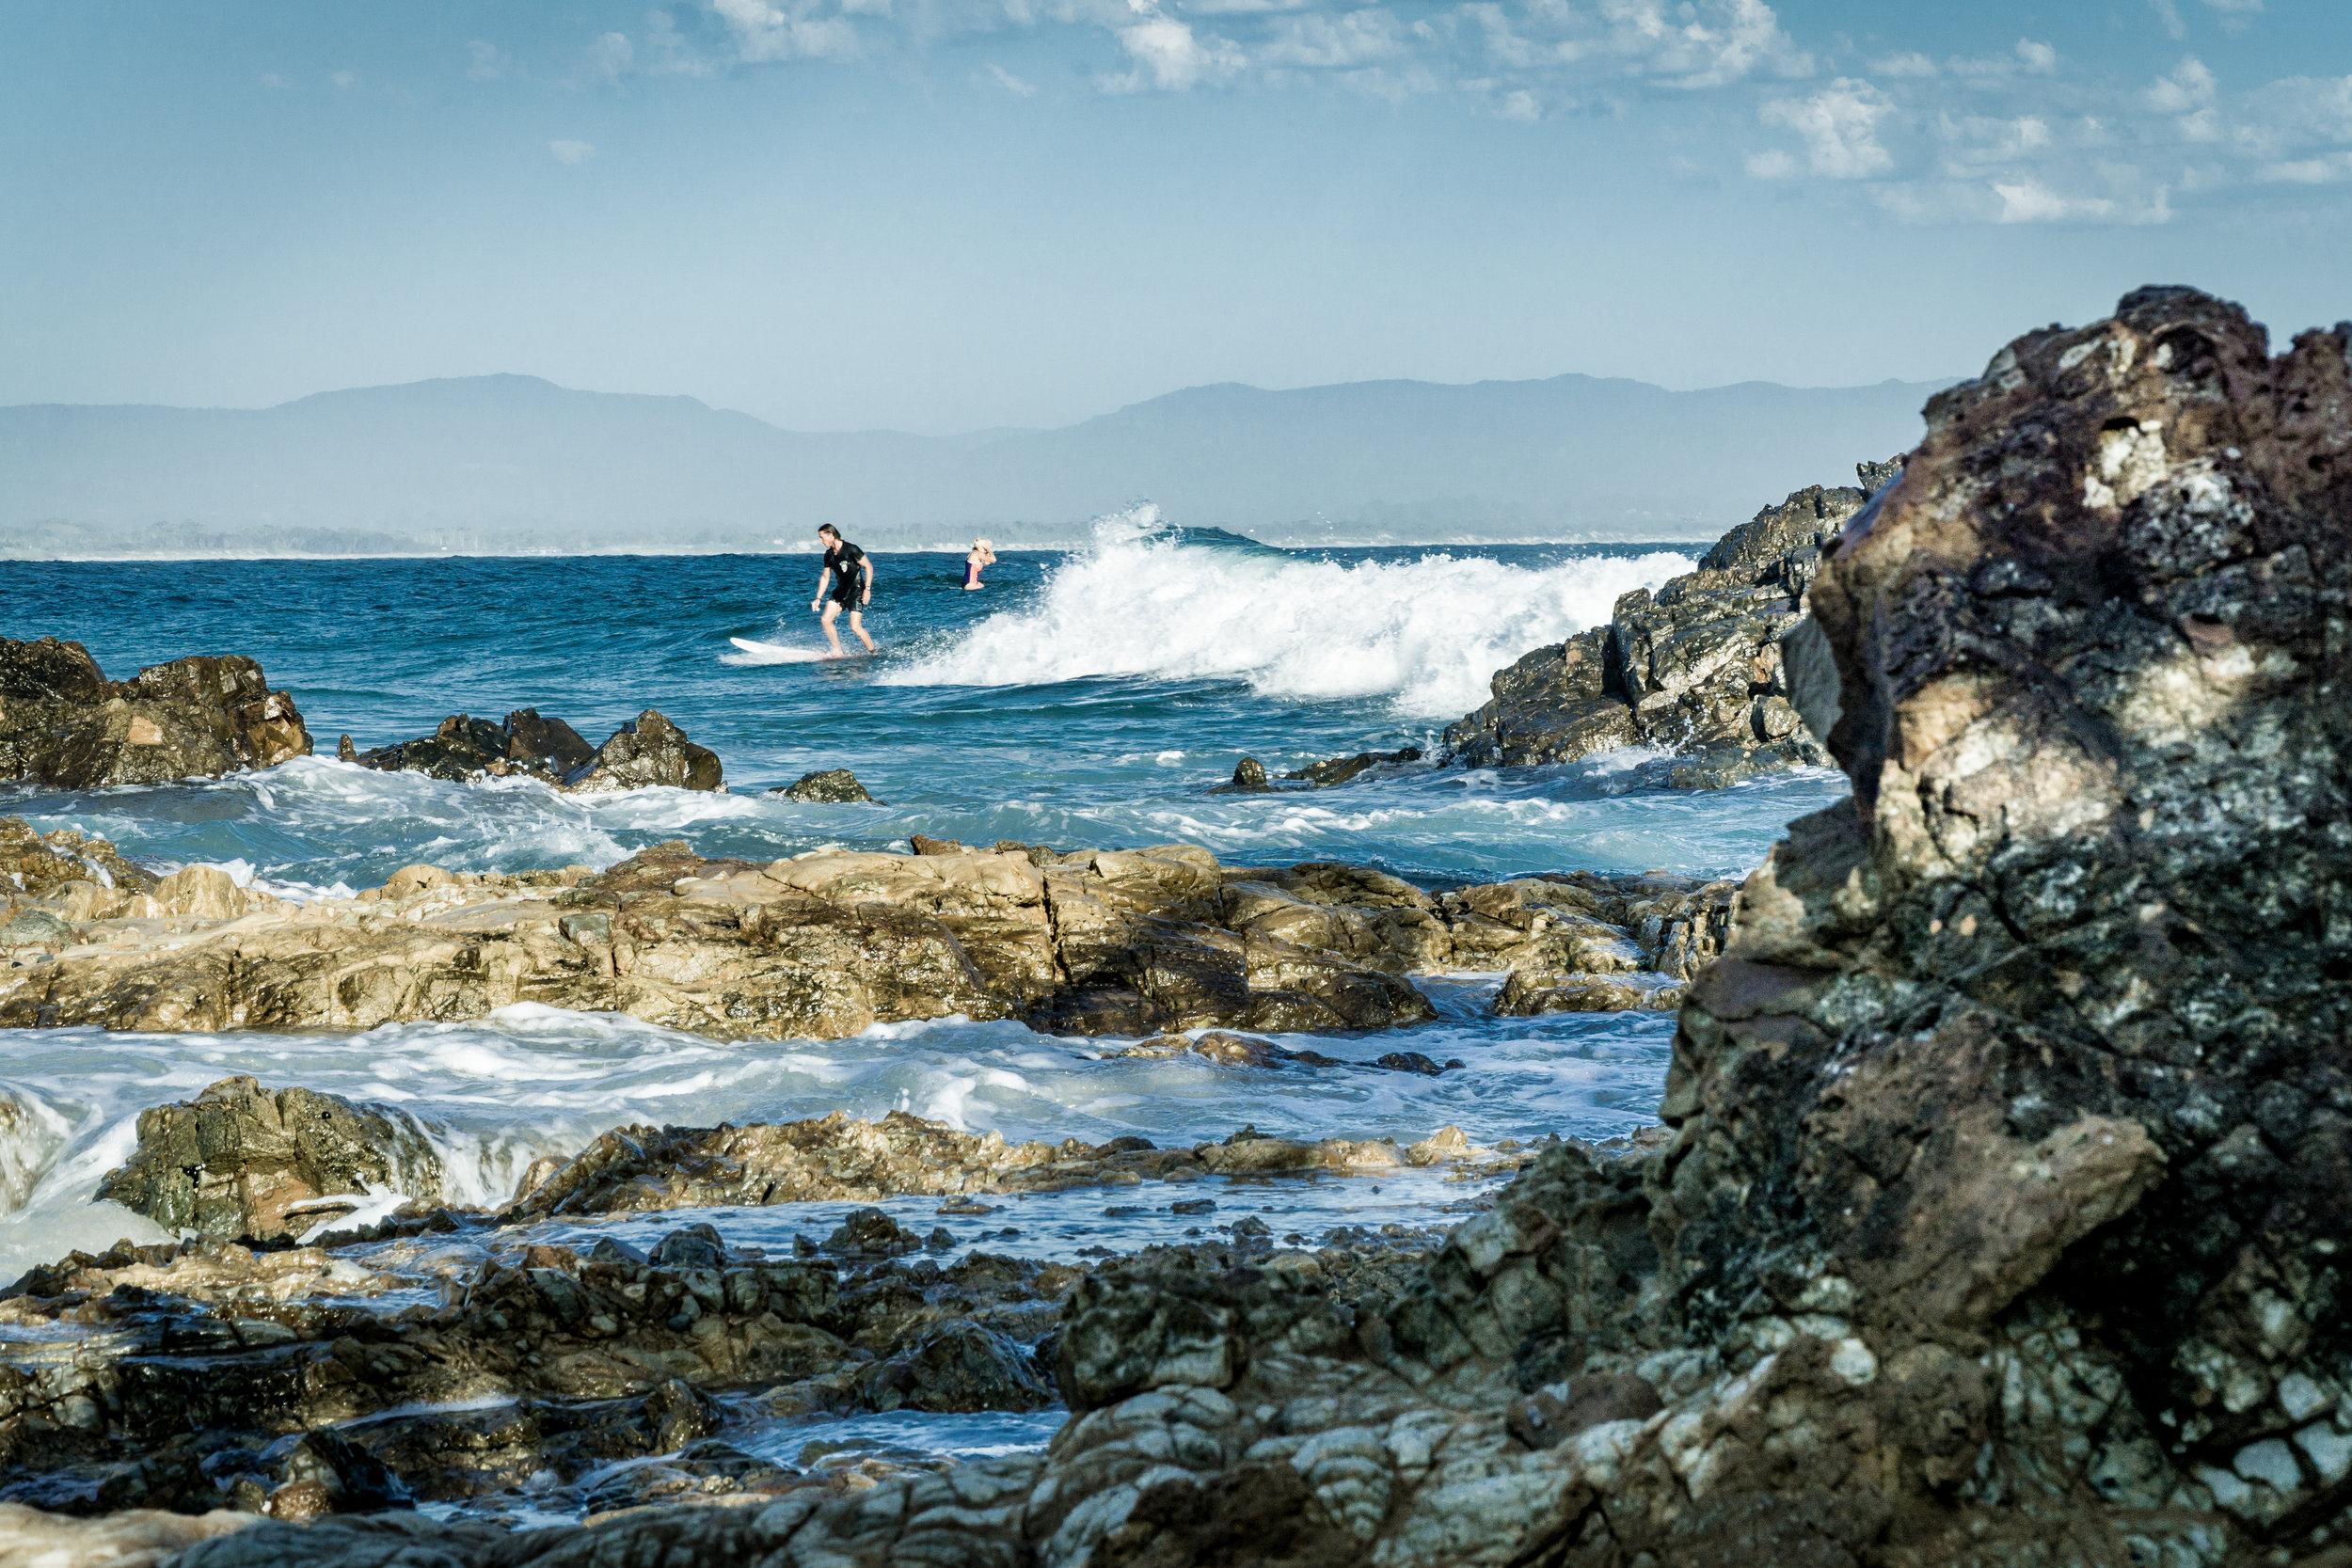 Byron Bay early morning surfers near Fisherman's Lookout